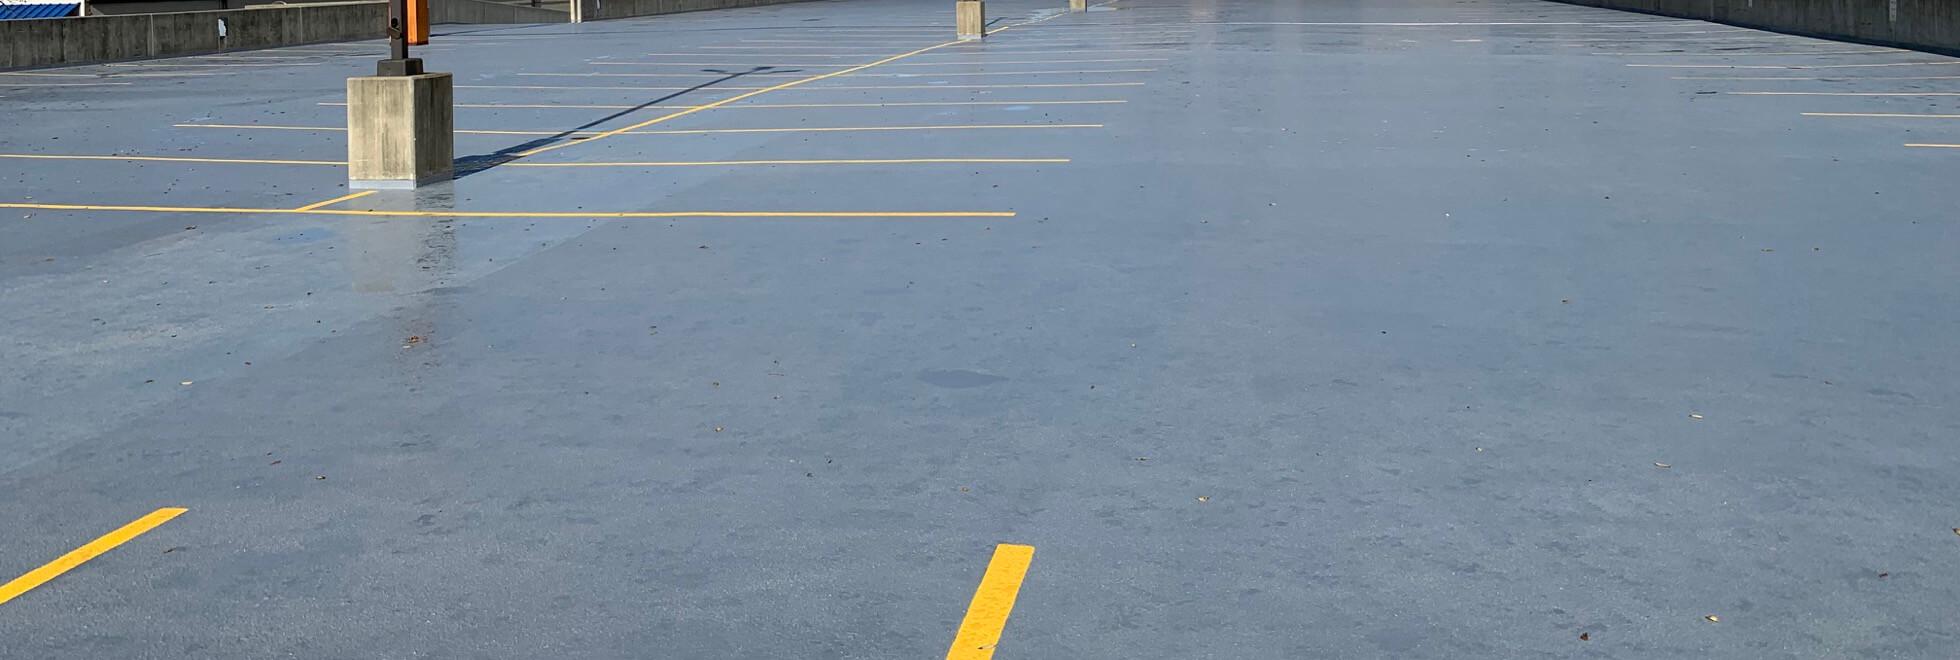 Parking Structures 1b